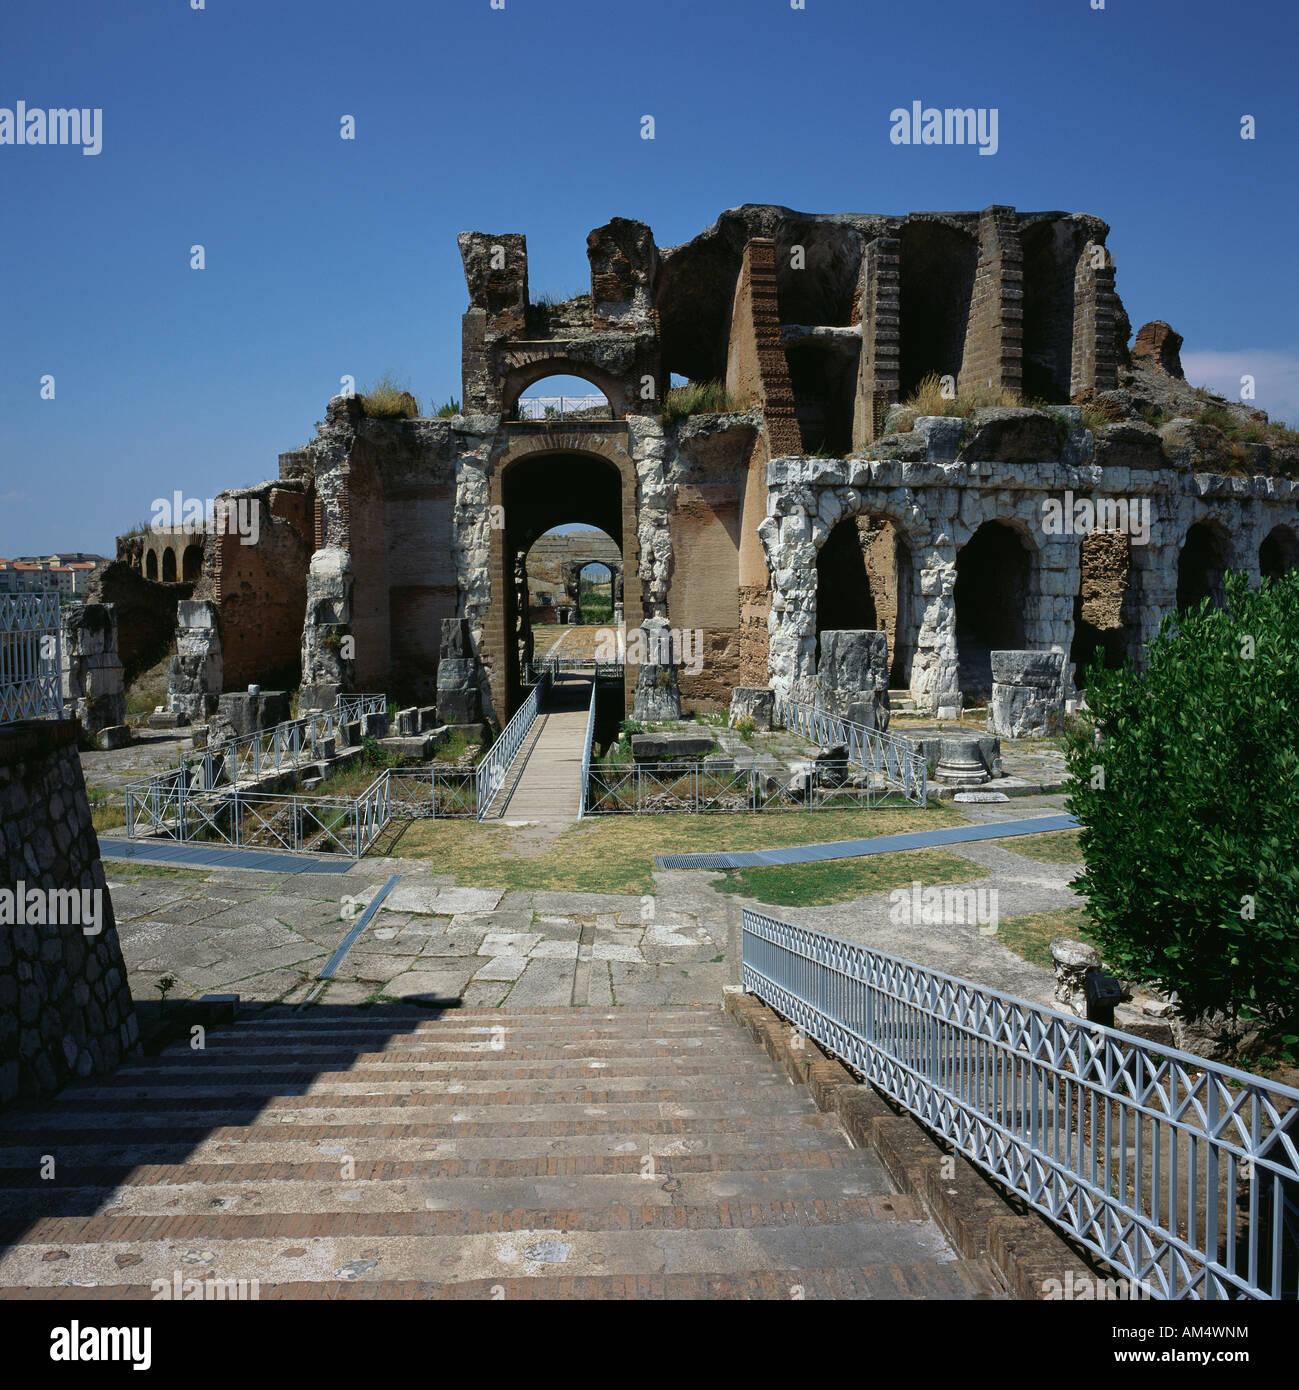 Santa maria capua vetere campania italy ancient remains of - Piscina santa maria capua vetere ...